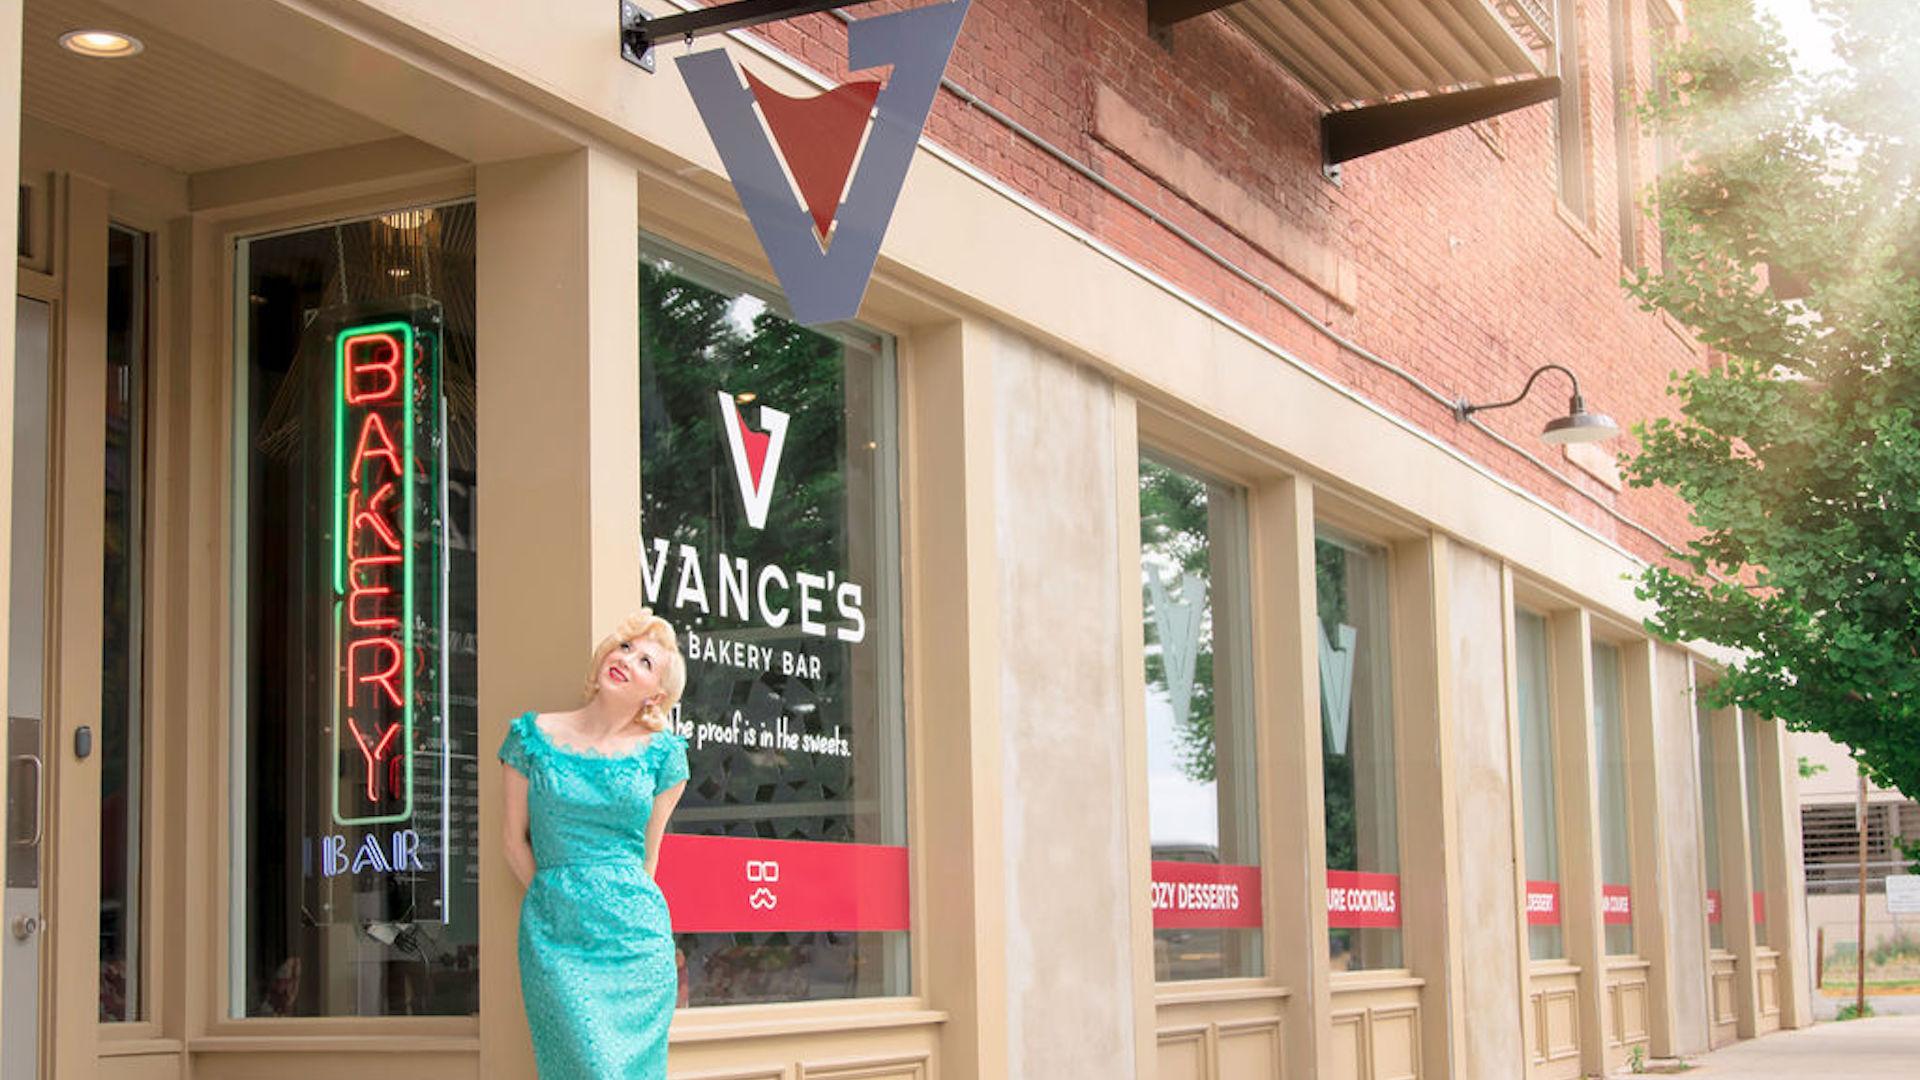 vances bakery bar storefront